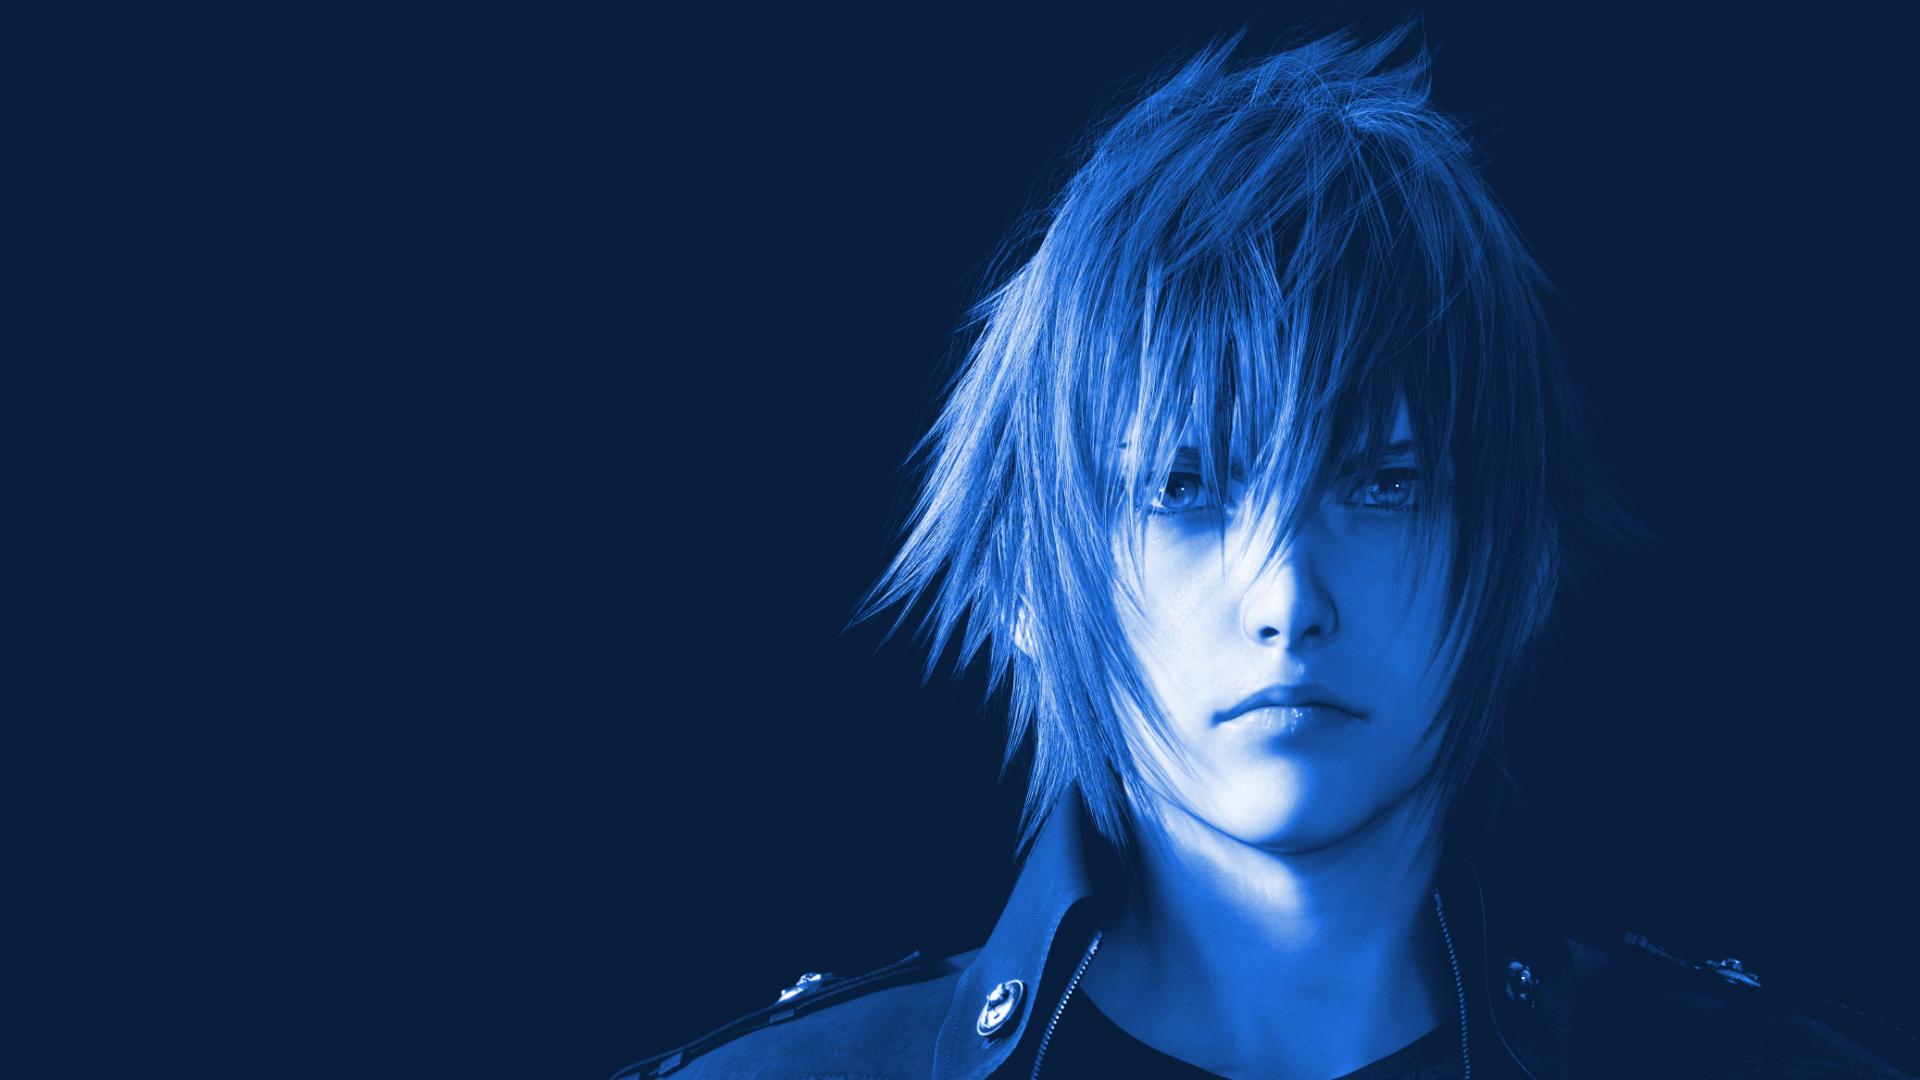 Free Download Noctis Wallpaper 2 Final Fantasy Xv Wallpaper